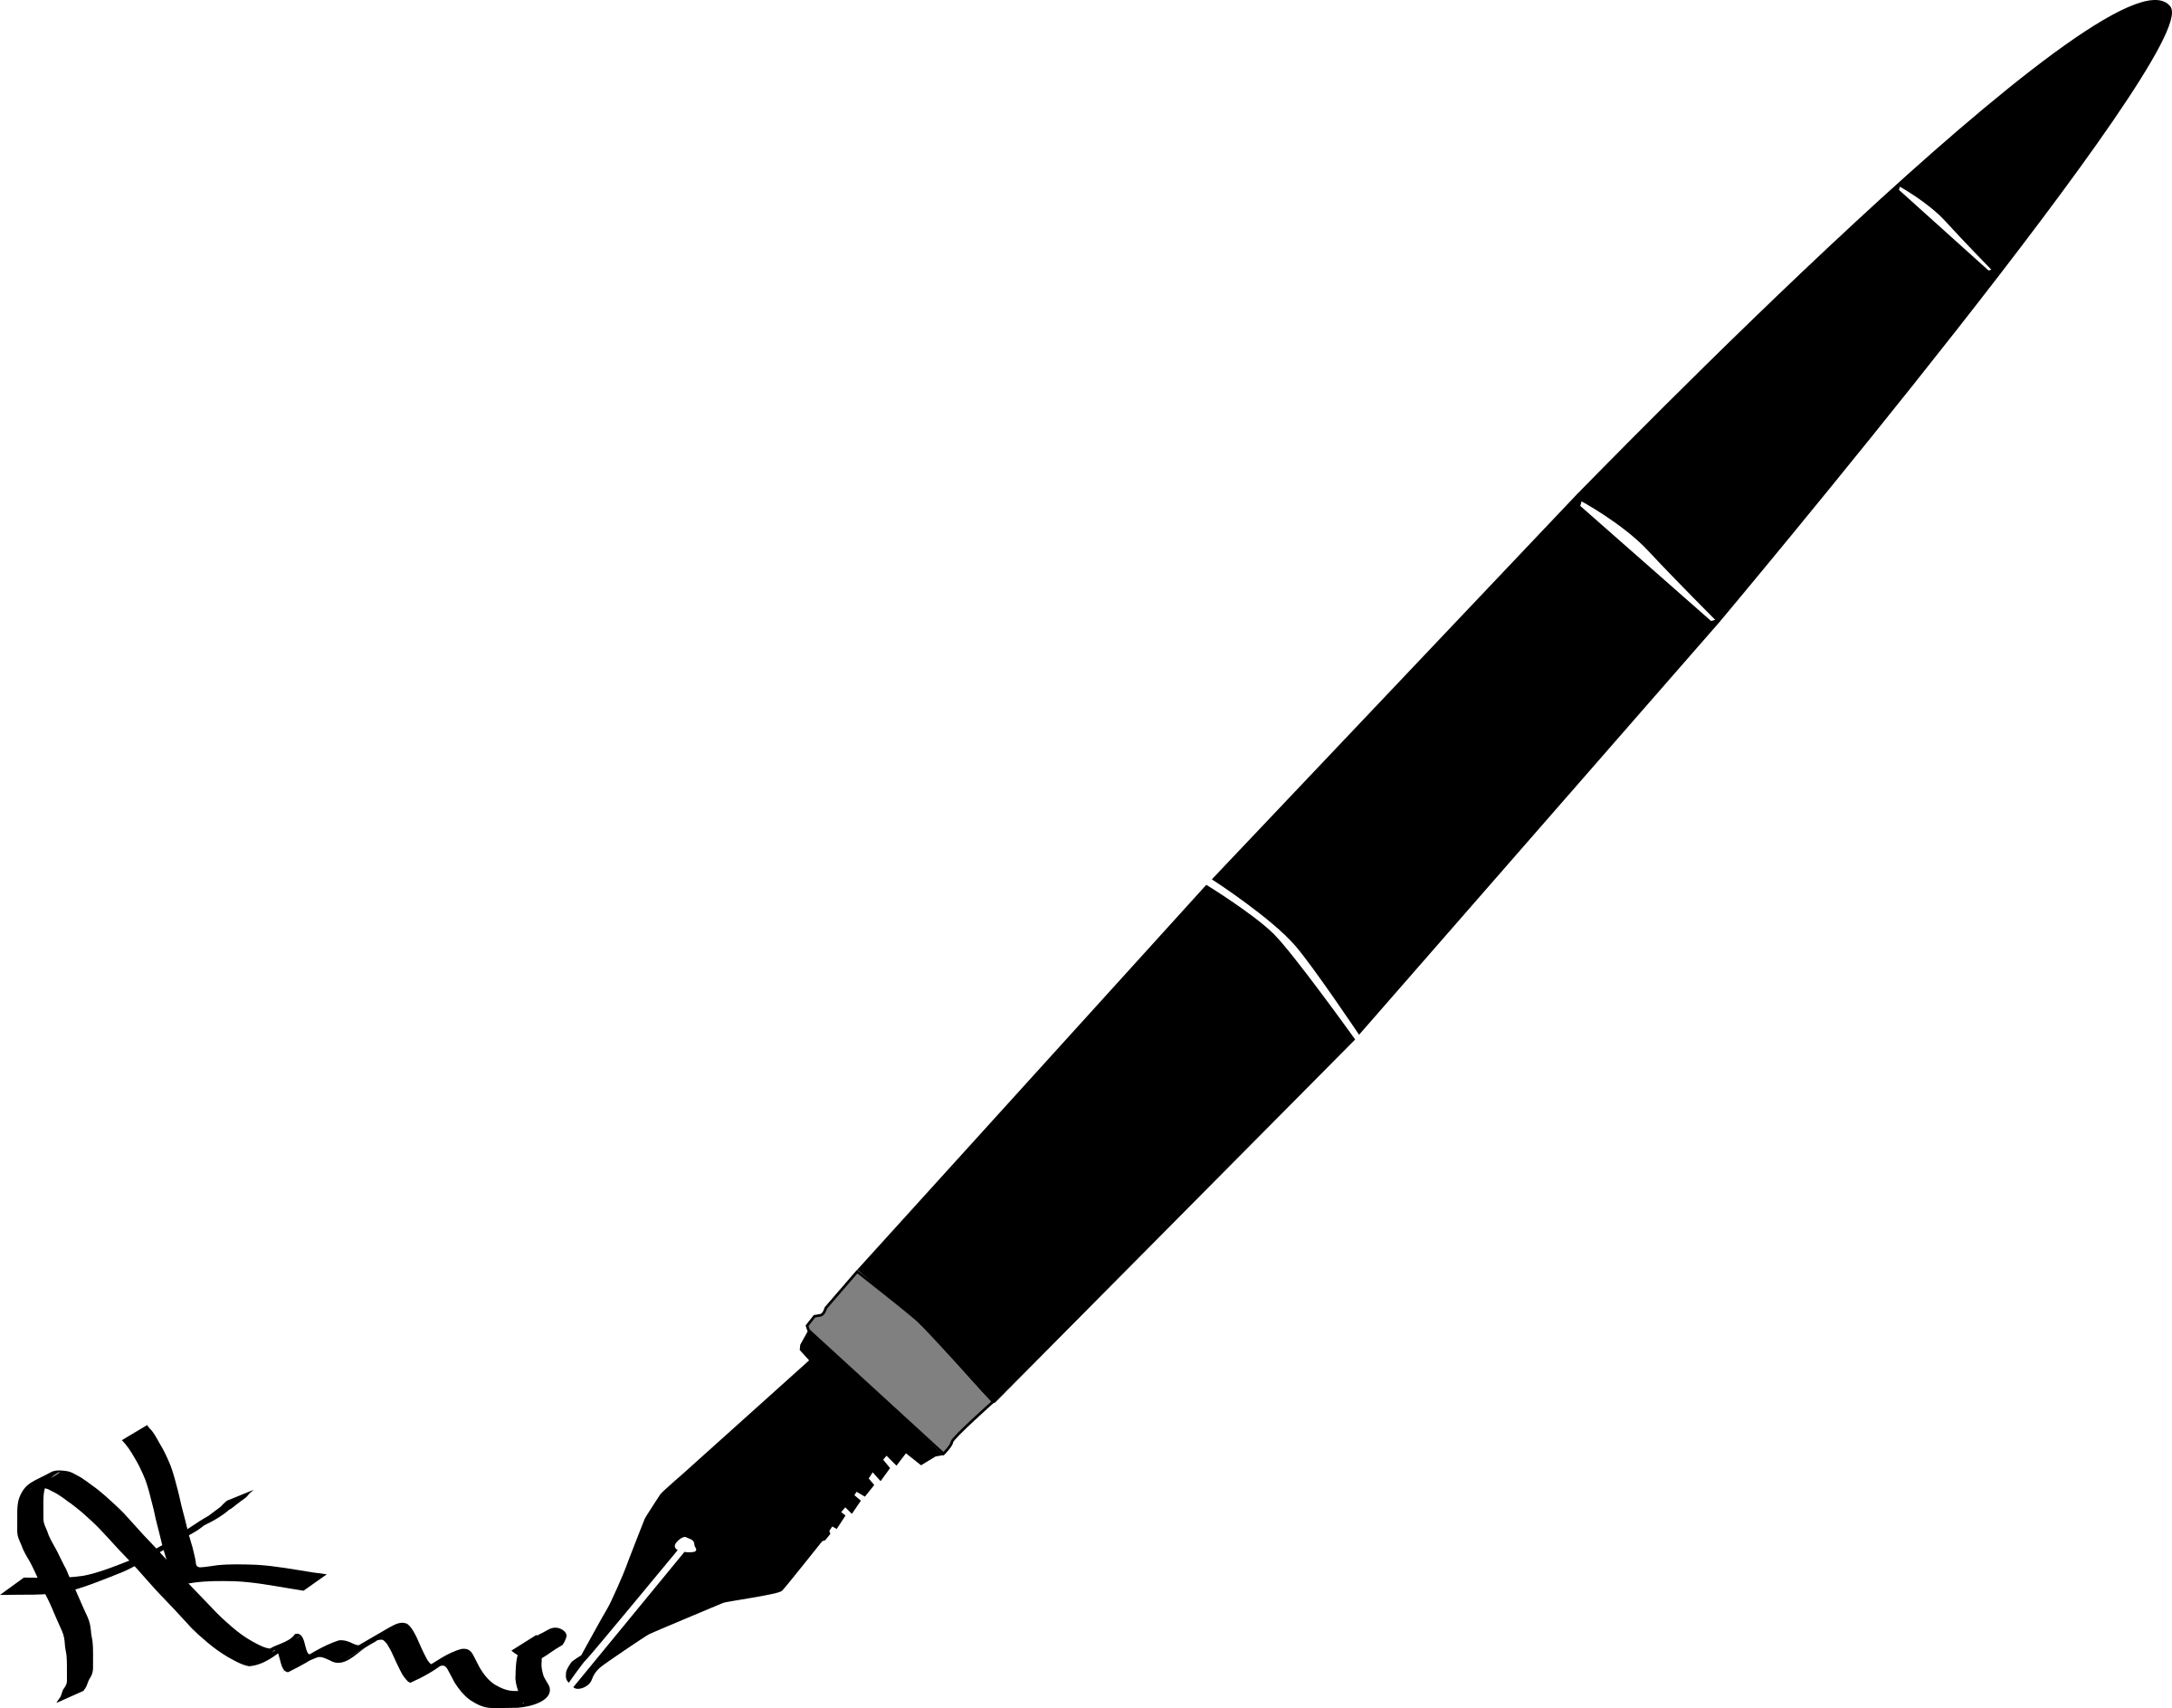 2400x1887 Clipart Pen